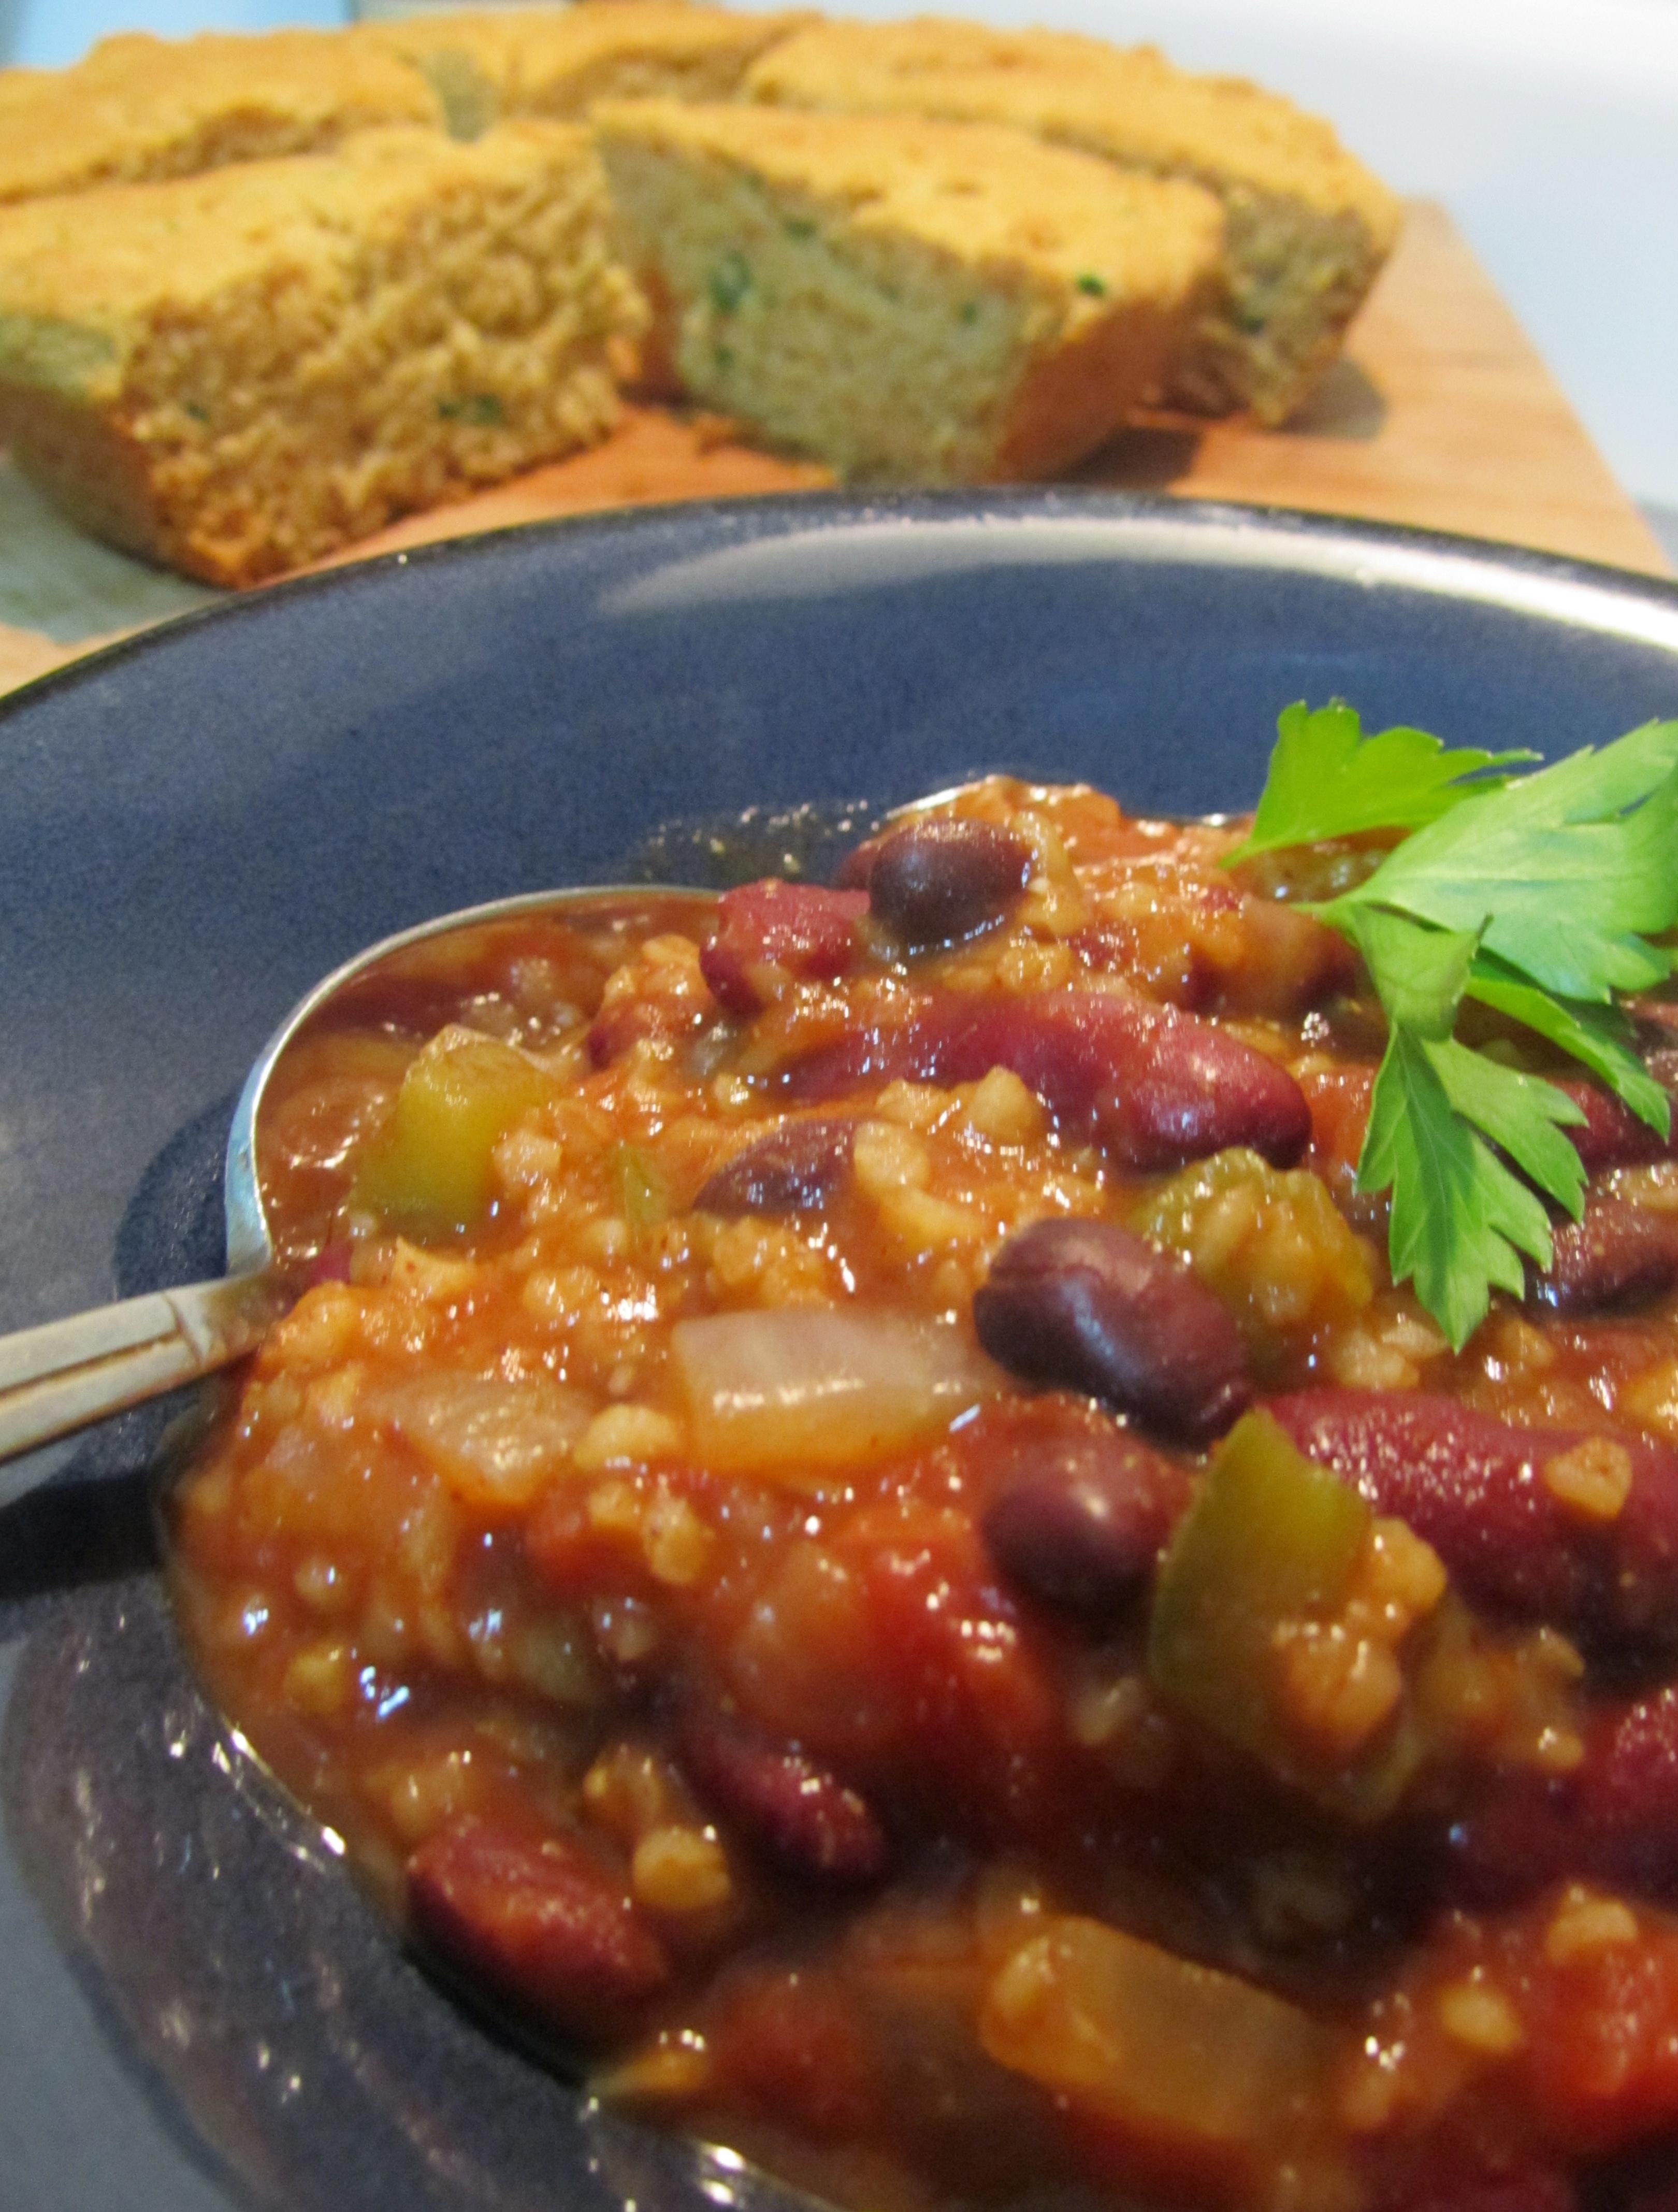 Two Bean and Bulgar Chili | Melanie daPonte, Vegan ...